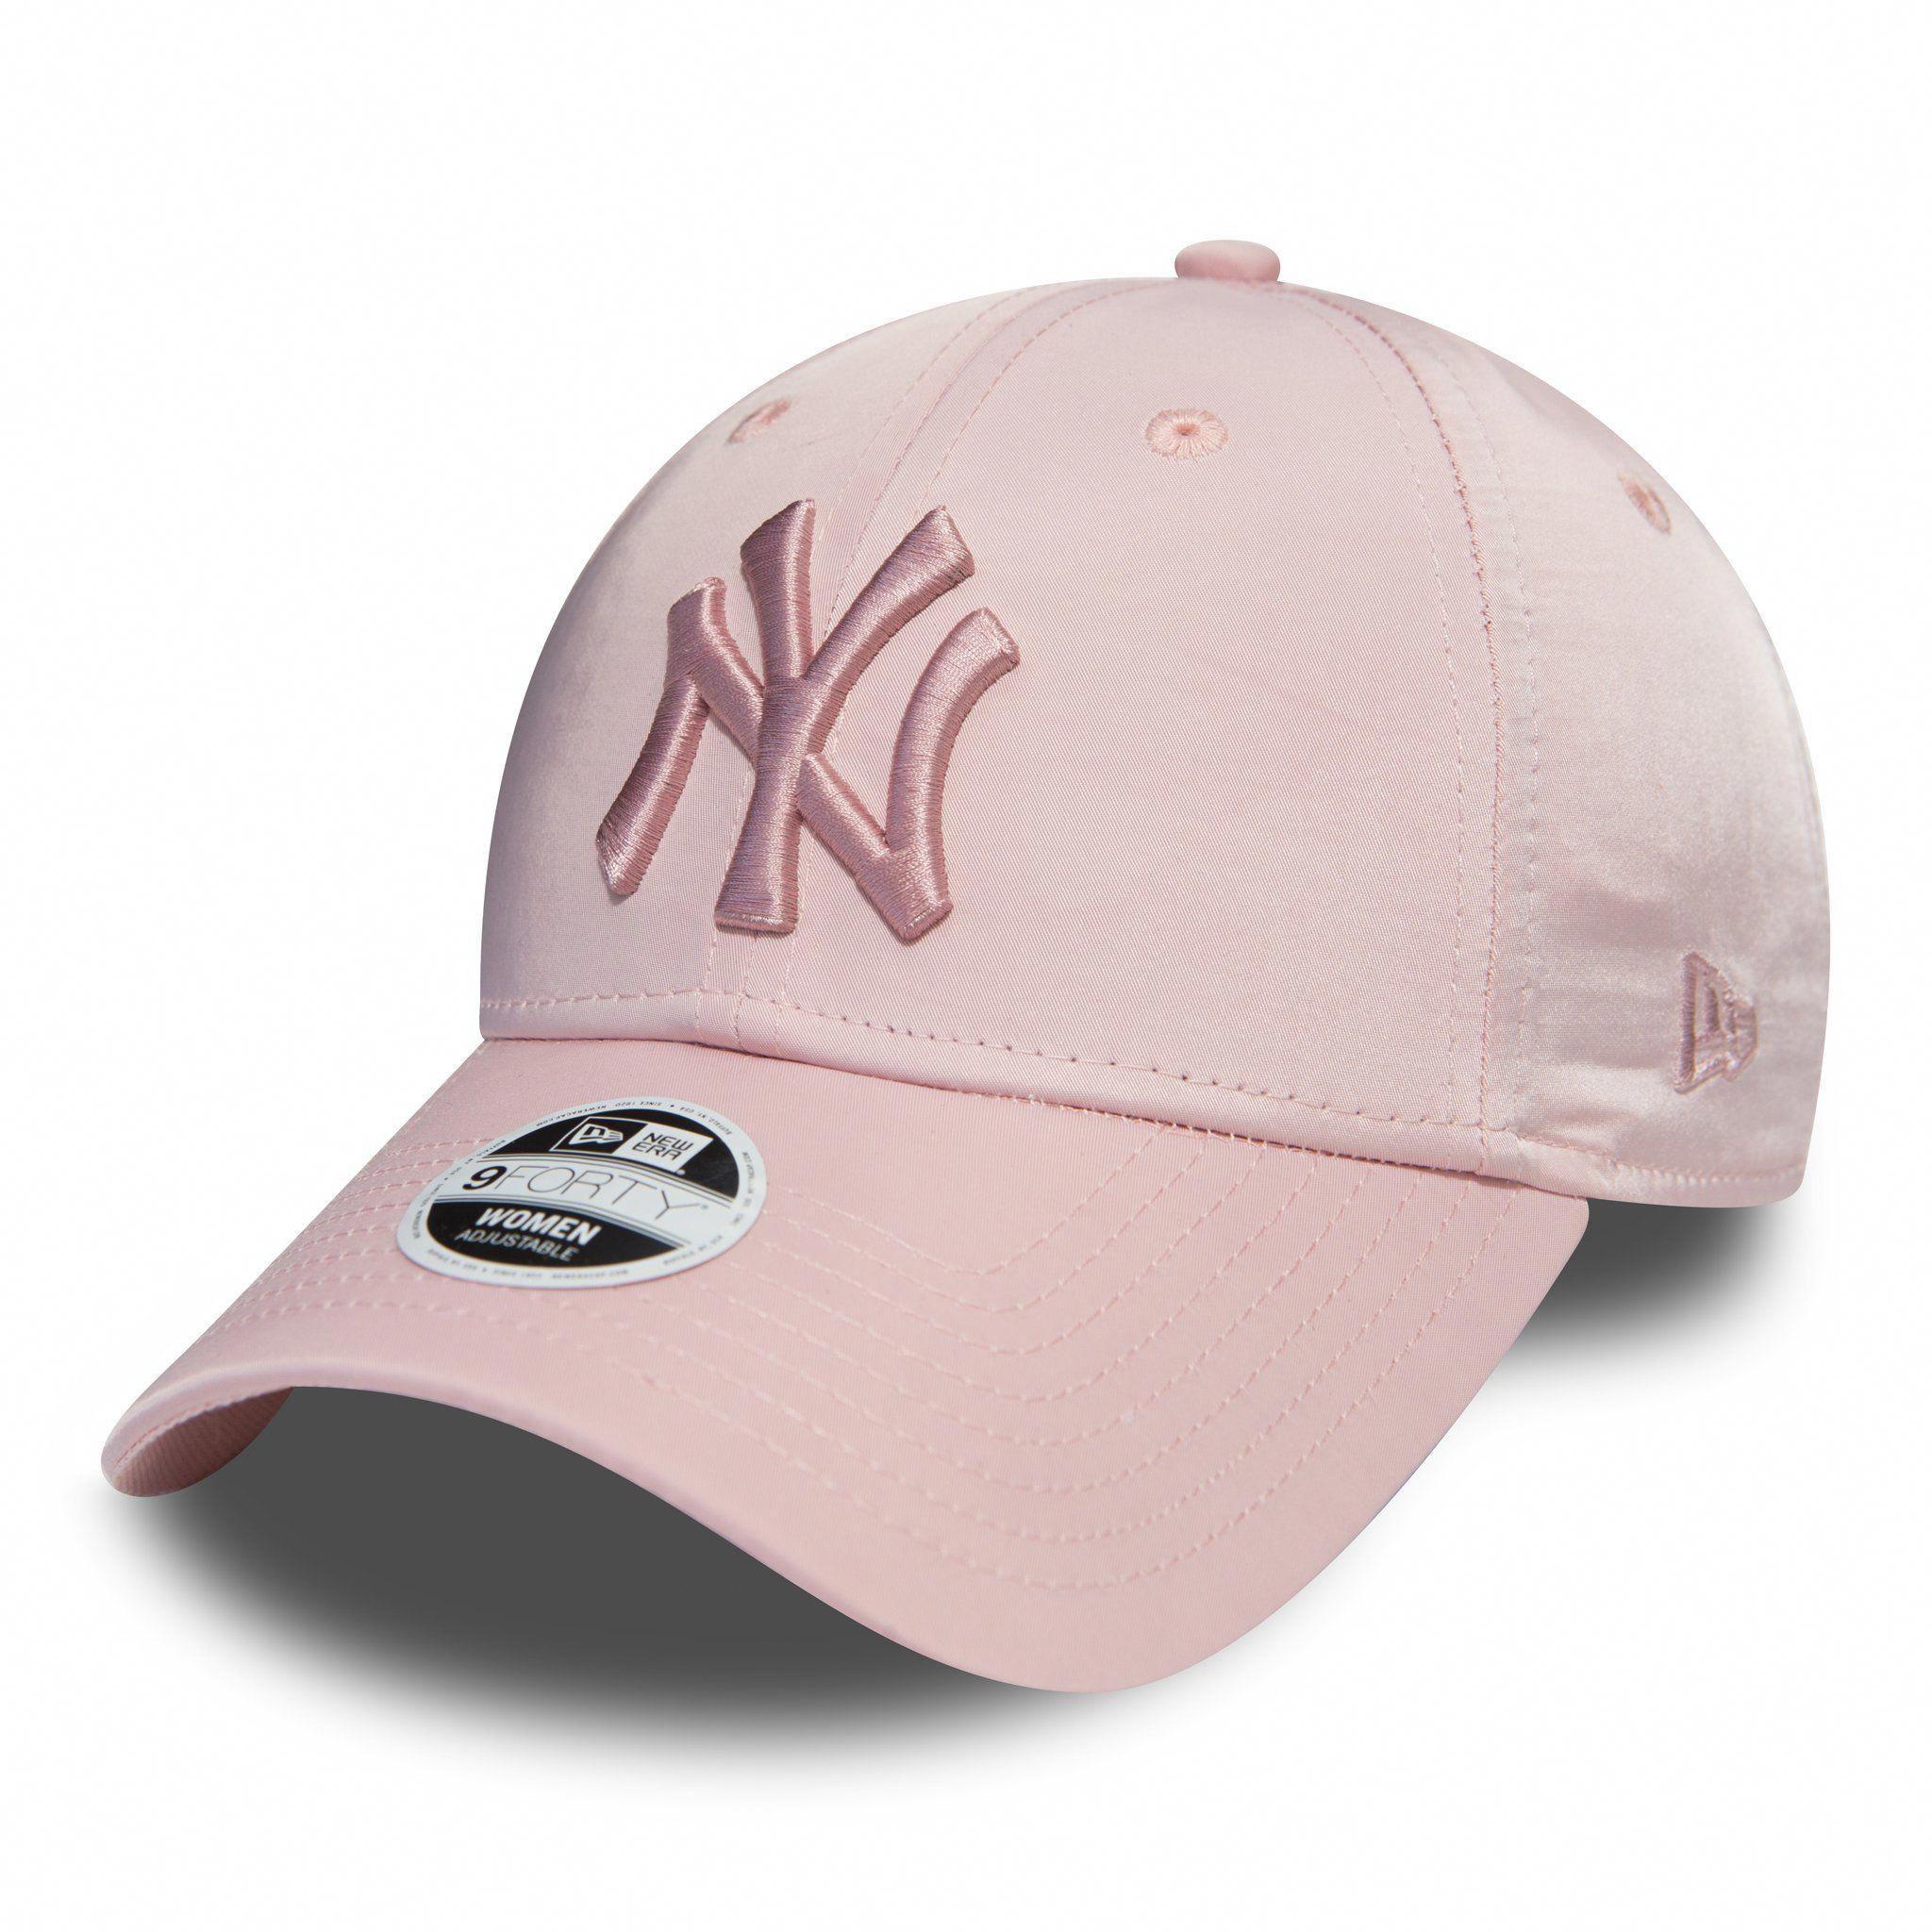 NY Yankees Womens New Era 940 Satin Pink Baseball Cap – lovemycap   baseballcaps b203fbbf8faf